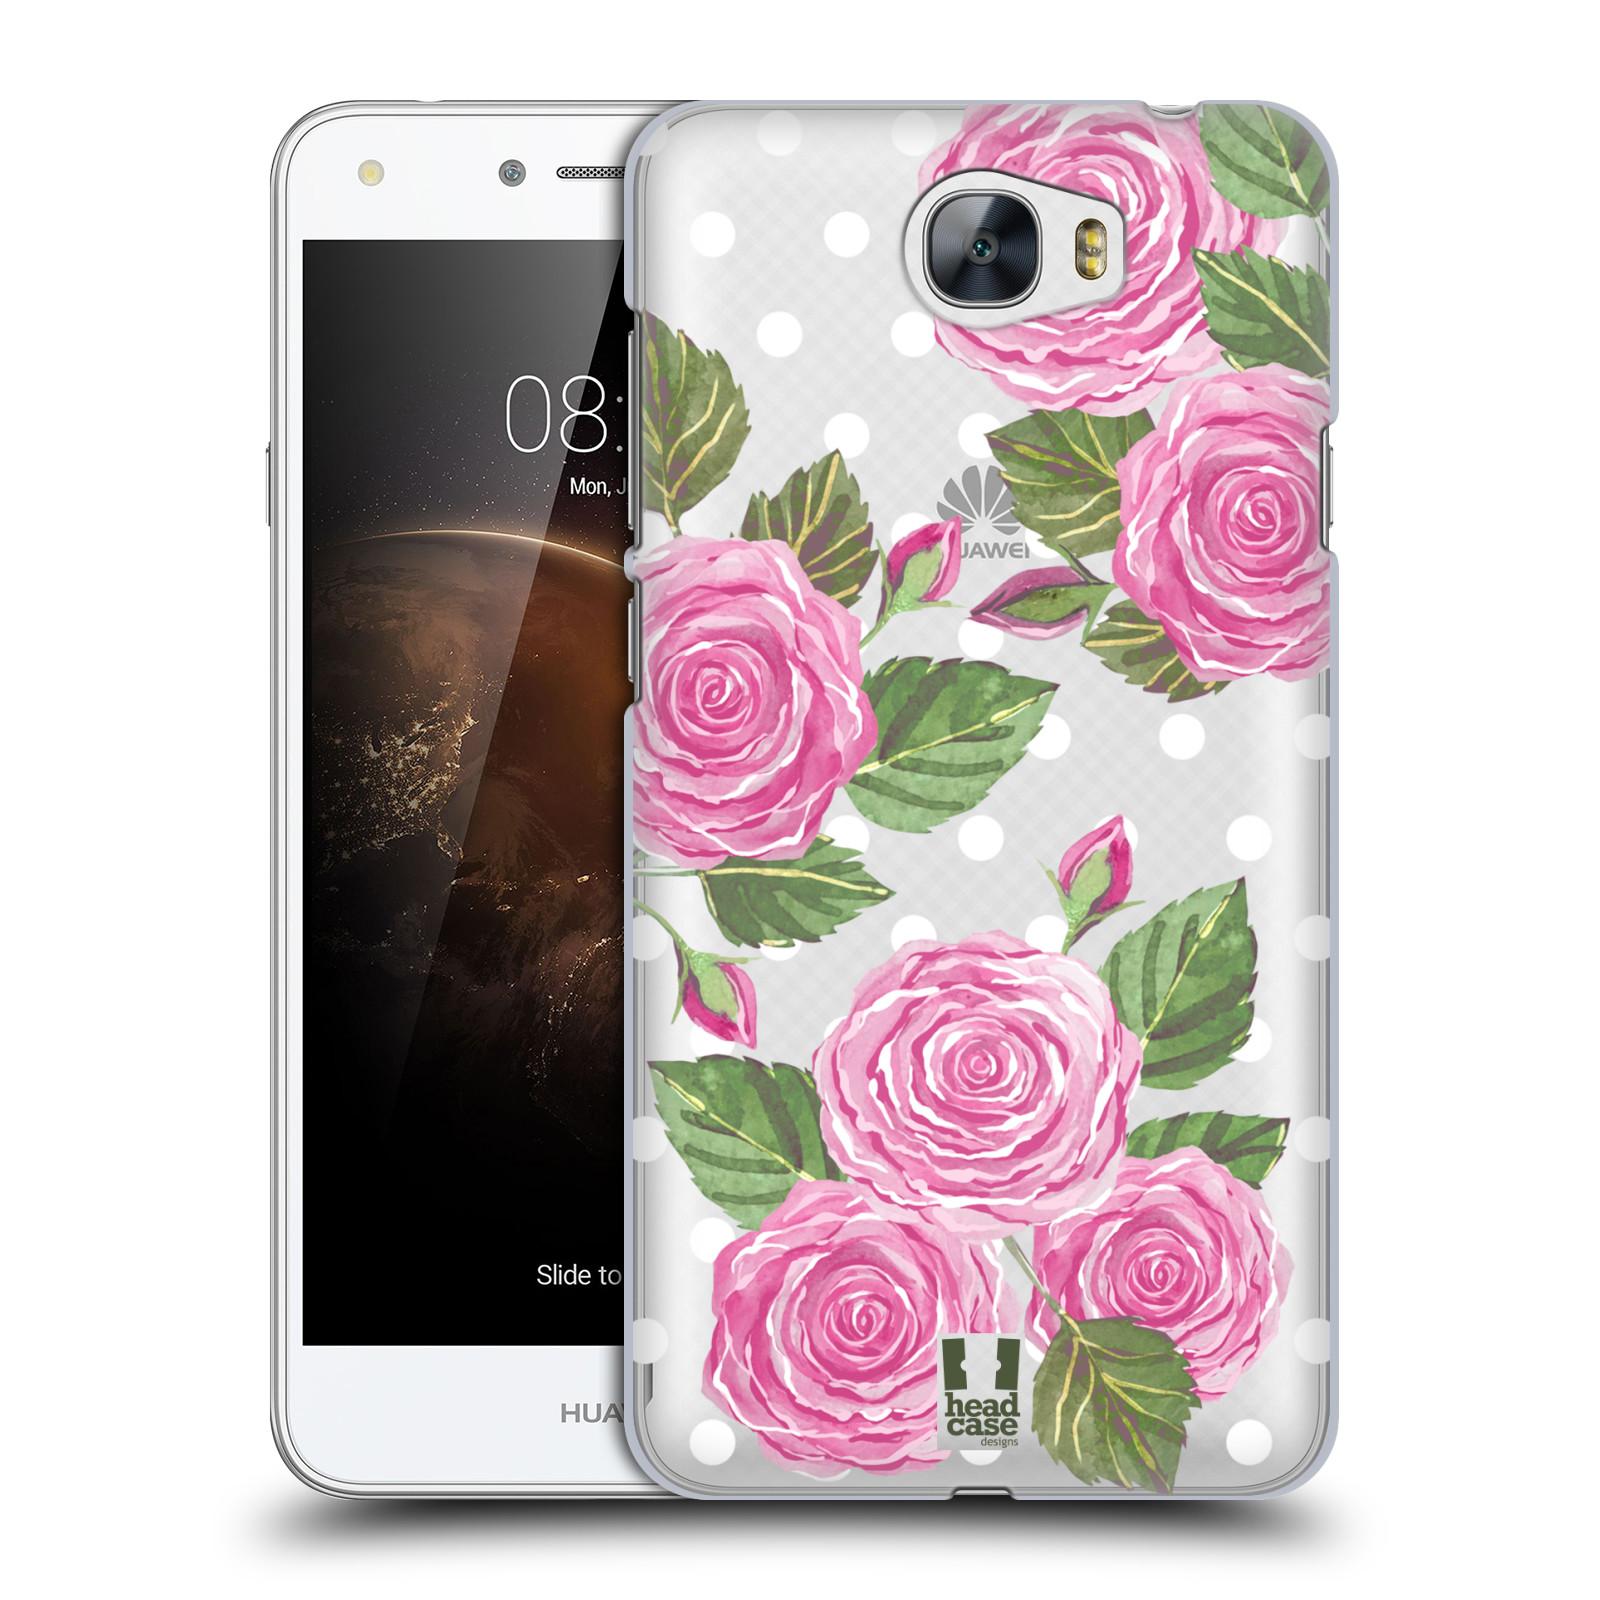 Plastové pouzdro na mobil Huawei Y6 II Compact - Head Case - Hezoučké růžičky - průhledné